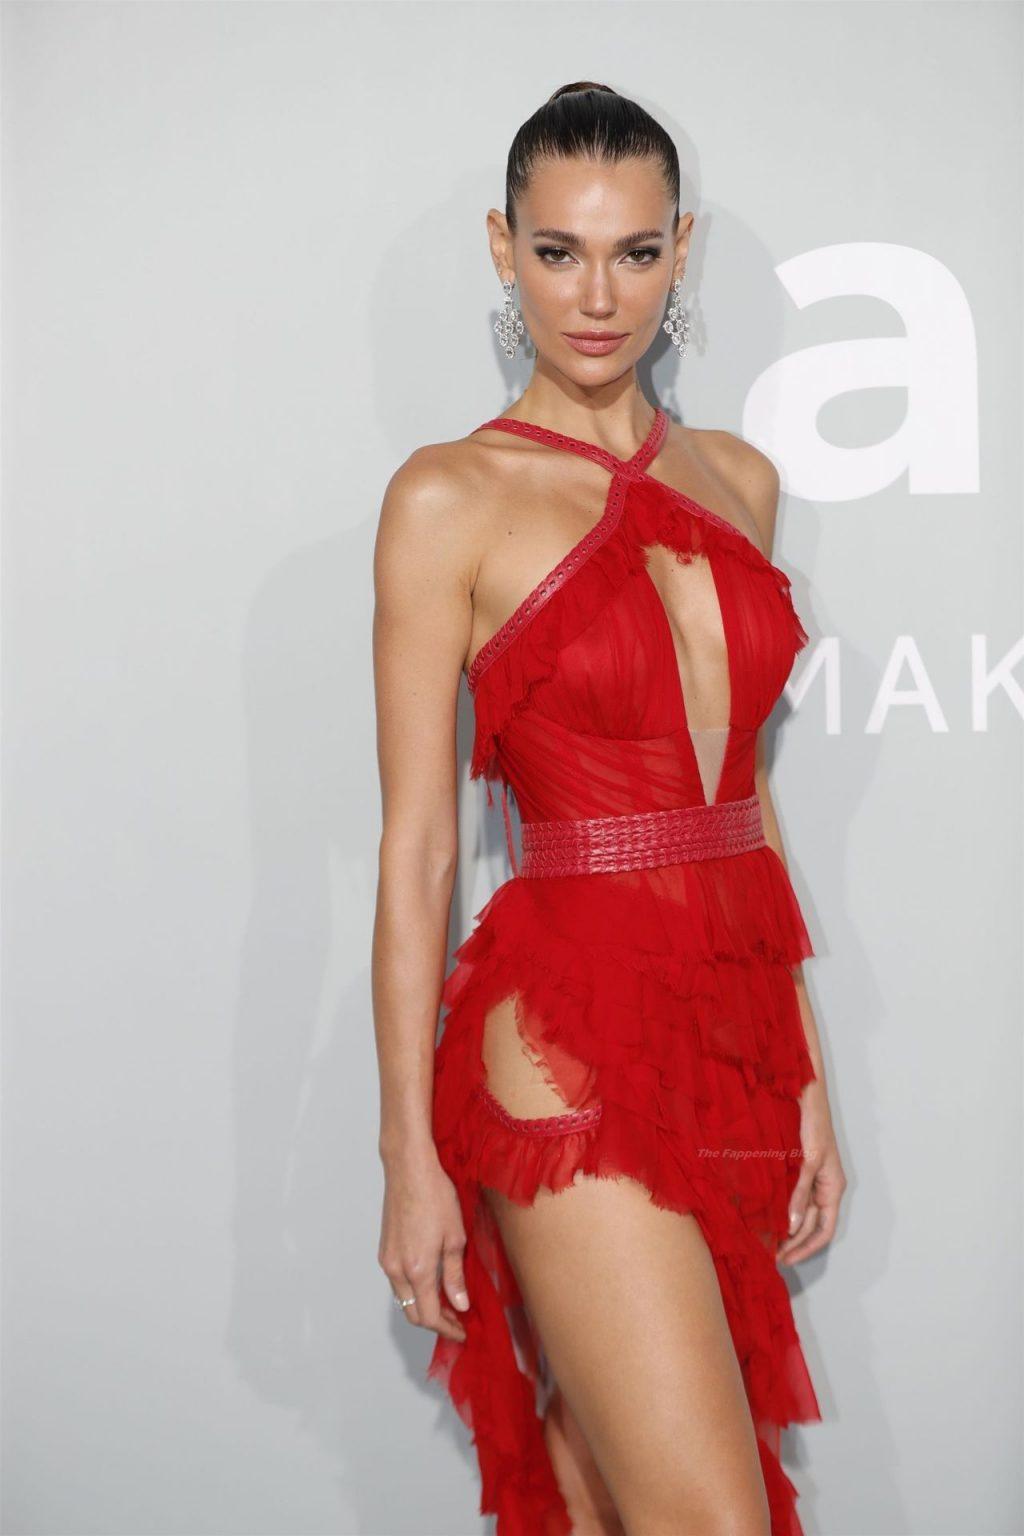 Chiara Sampaio Poses in a See-Through Red Dress at the 74th Annual Cannes Film Festival (13 Photos)